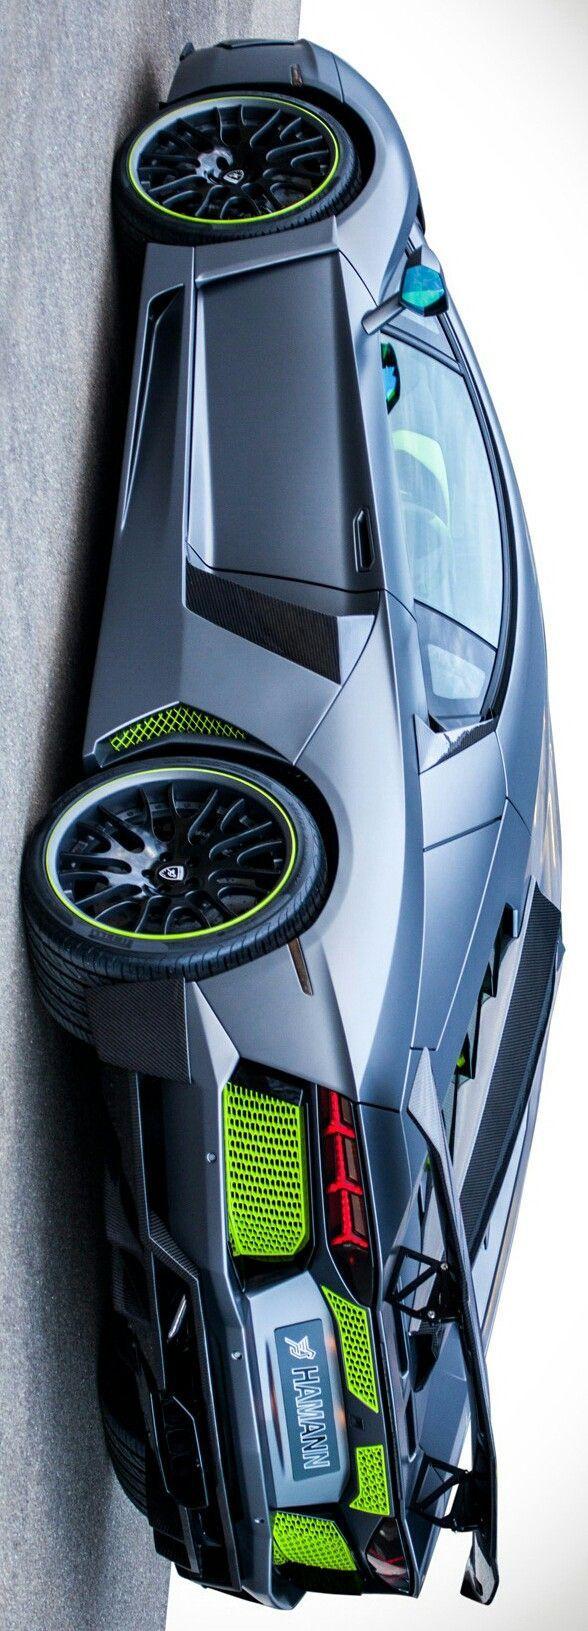 HAMANN Lamborghini Aventador Limited by Levon - https://www.luxury.guugles.com/hamann-lamborghini-aventador-limited-by-levon/